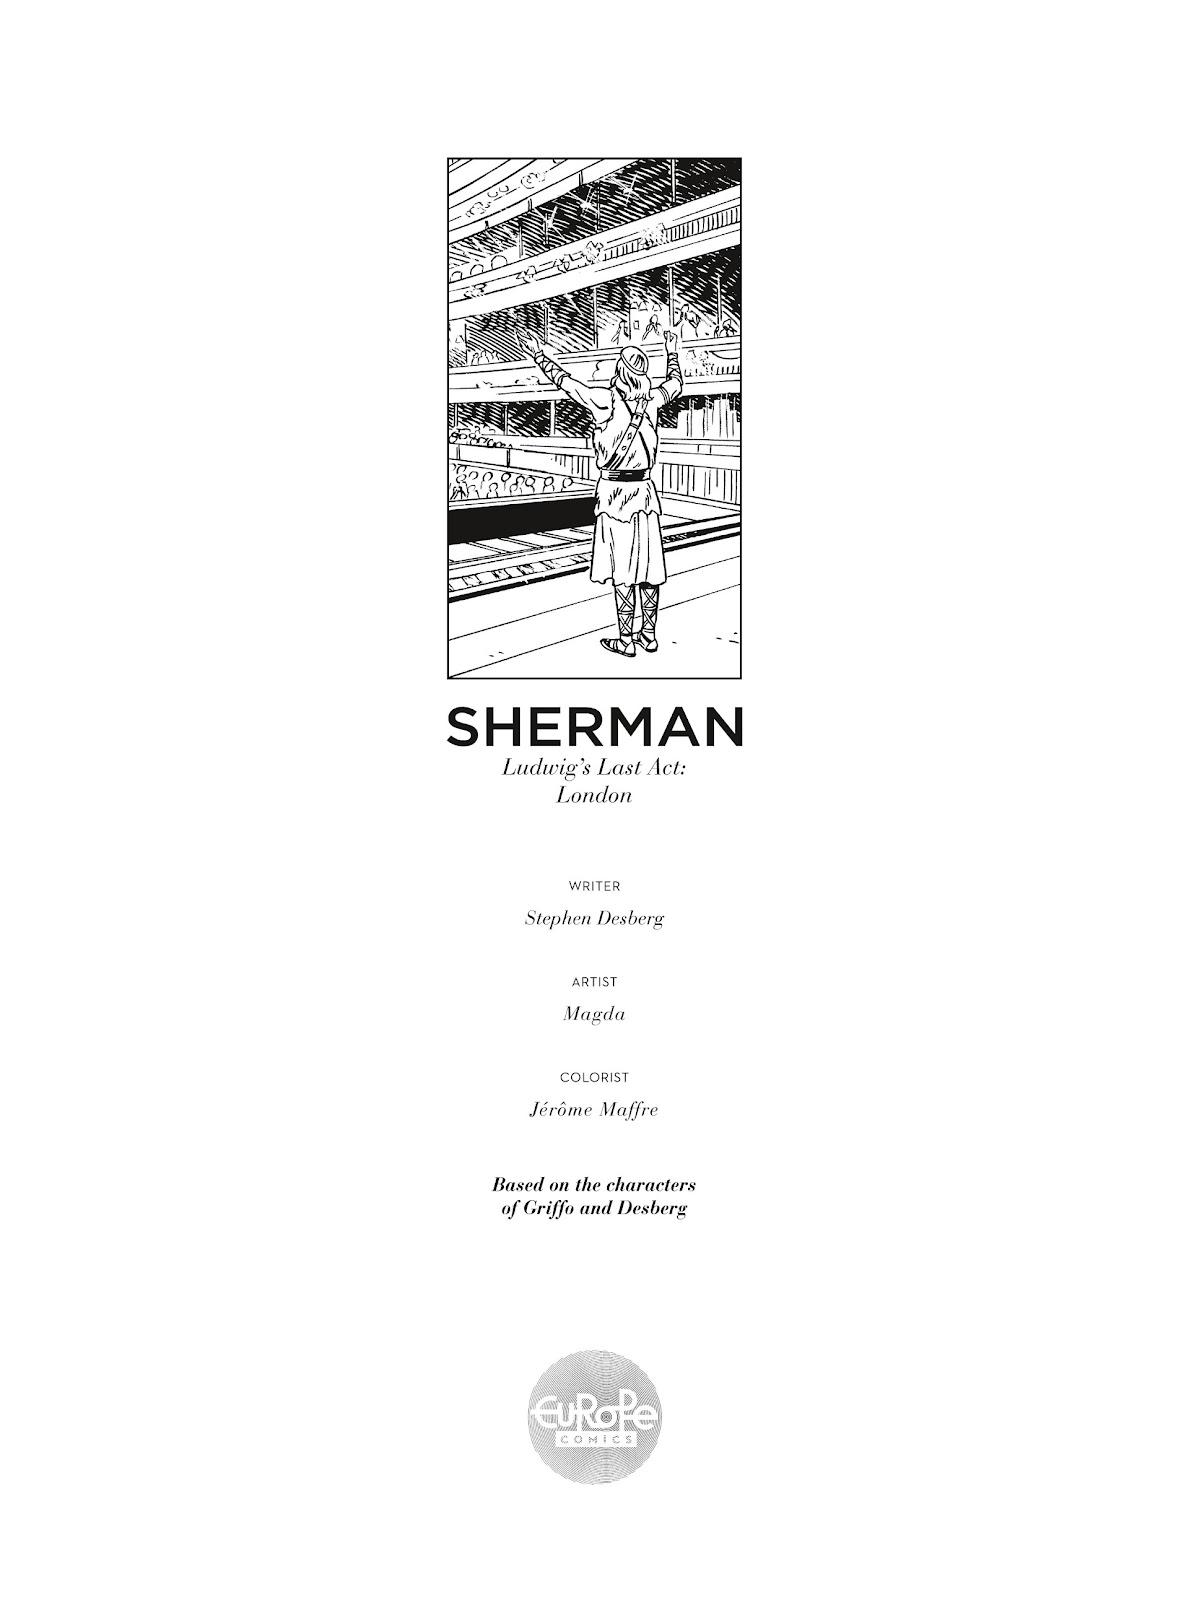 Read online Sherman comic -  Issue #7 - 2